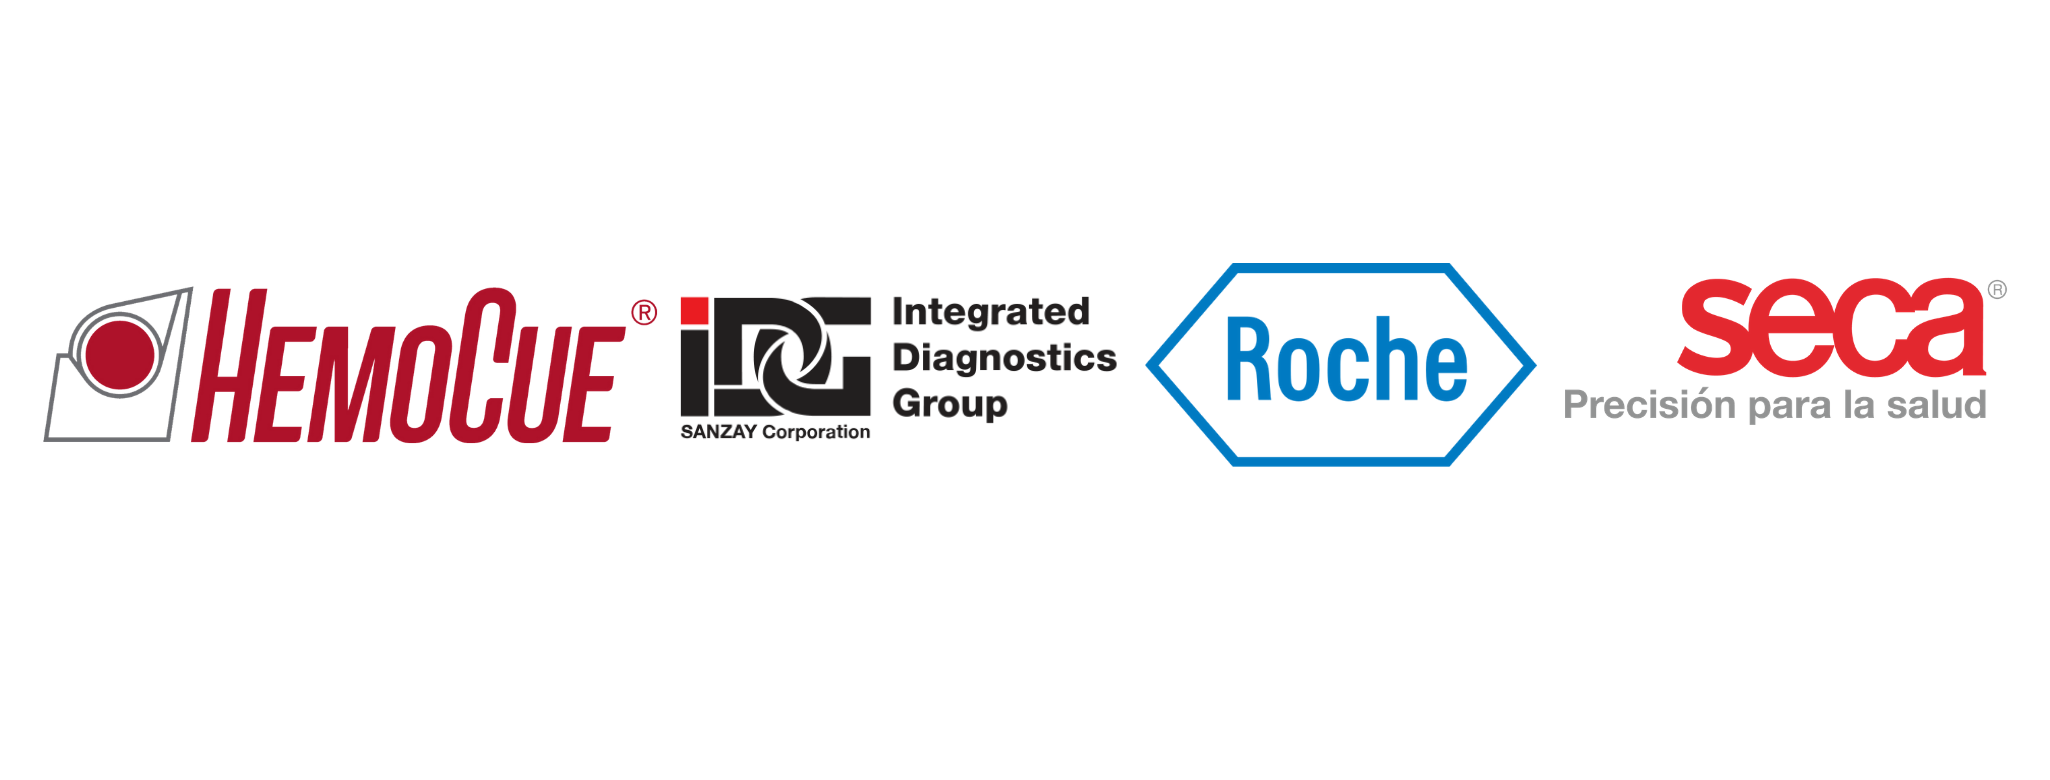 Hemocue-IDG-Roche-Seca